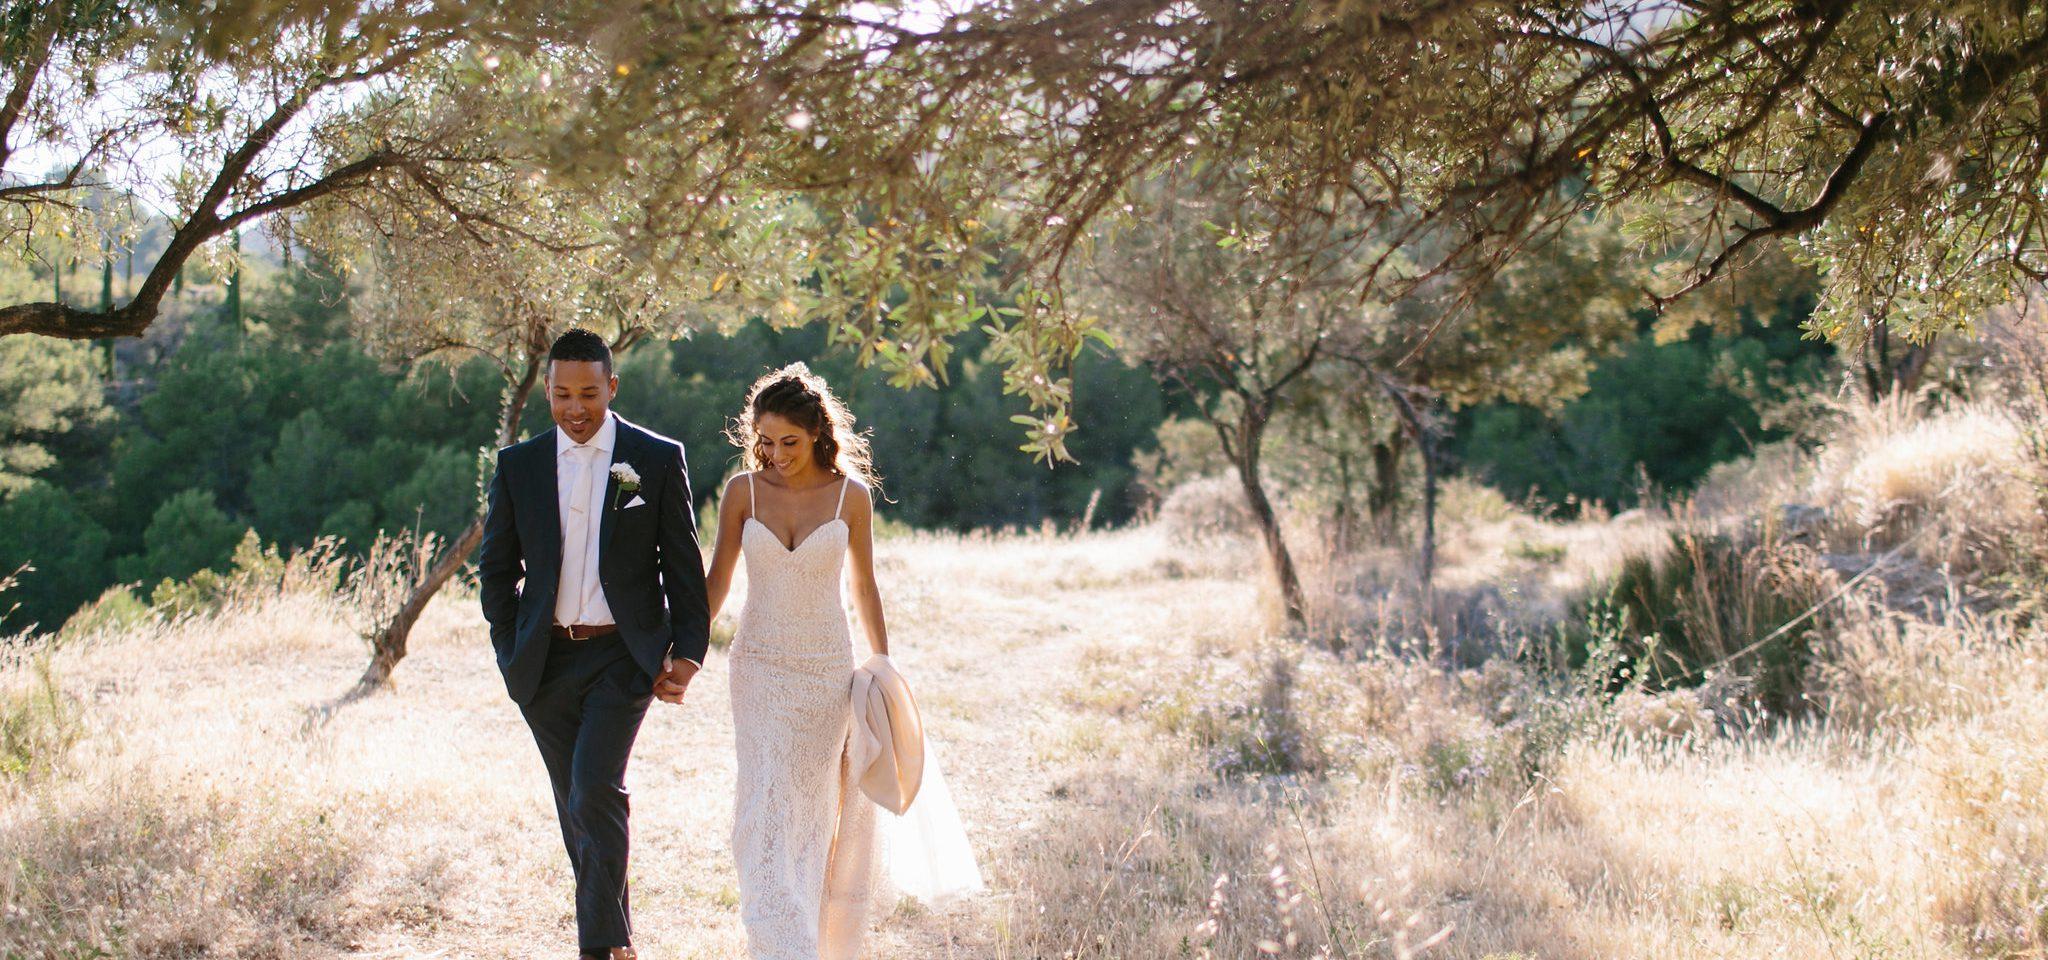 bright wedding photos destination wedding photos romantic